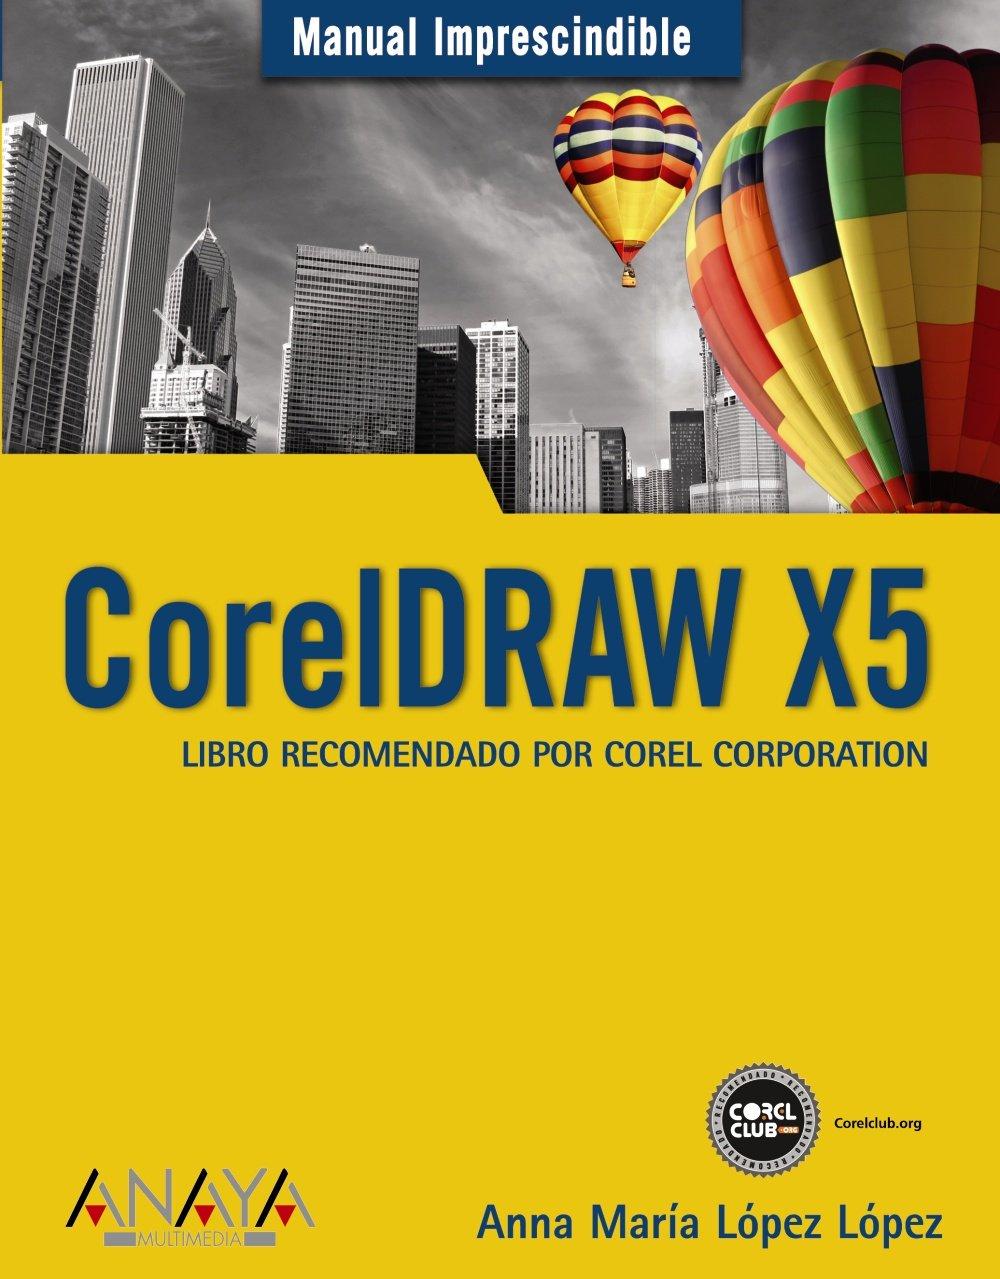 coreldraw x5 manual inprescindible essential manual spanish rh amazon com corel x5 manual pdf corel draw x5 manual english